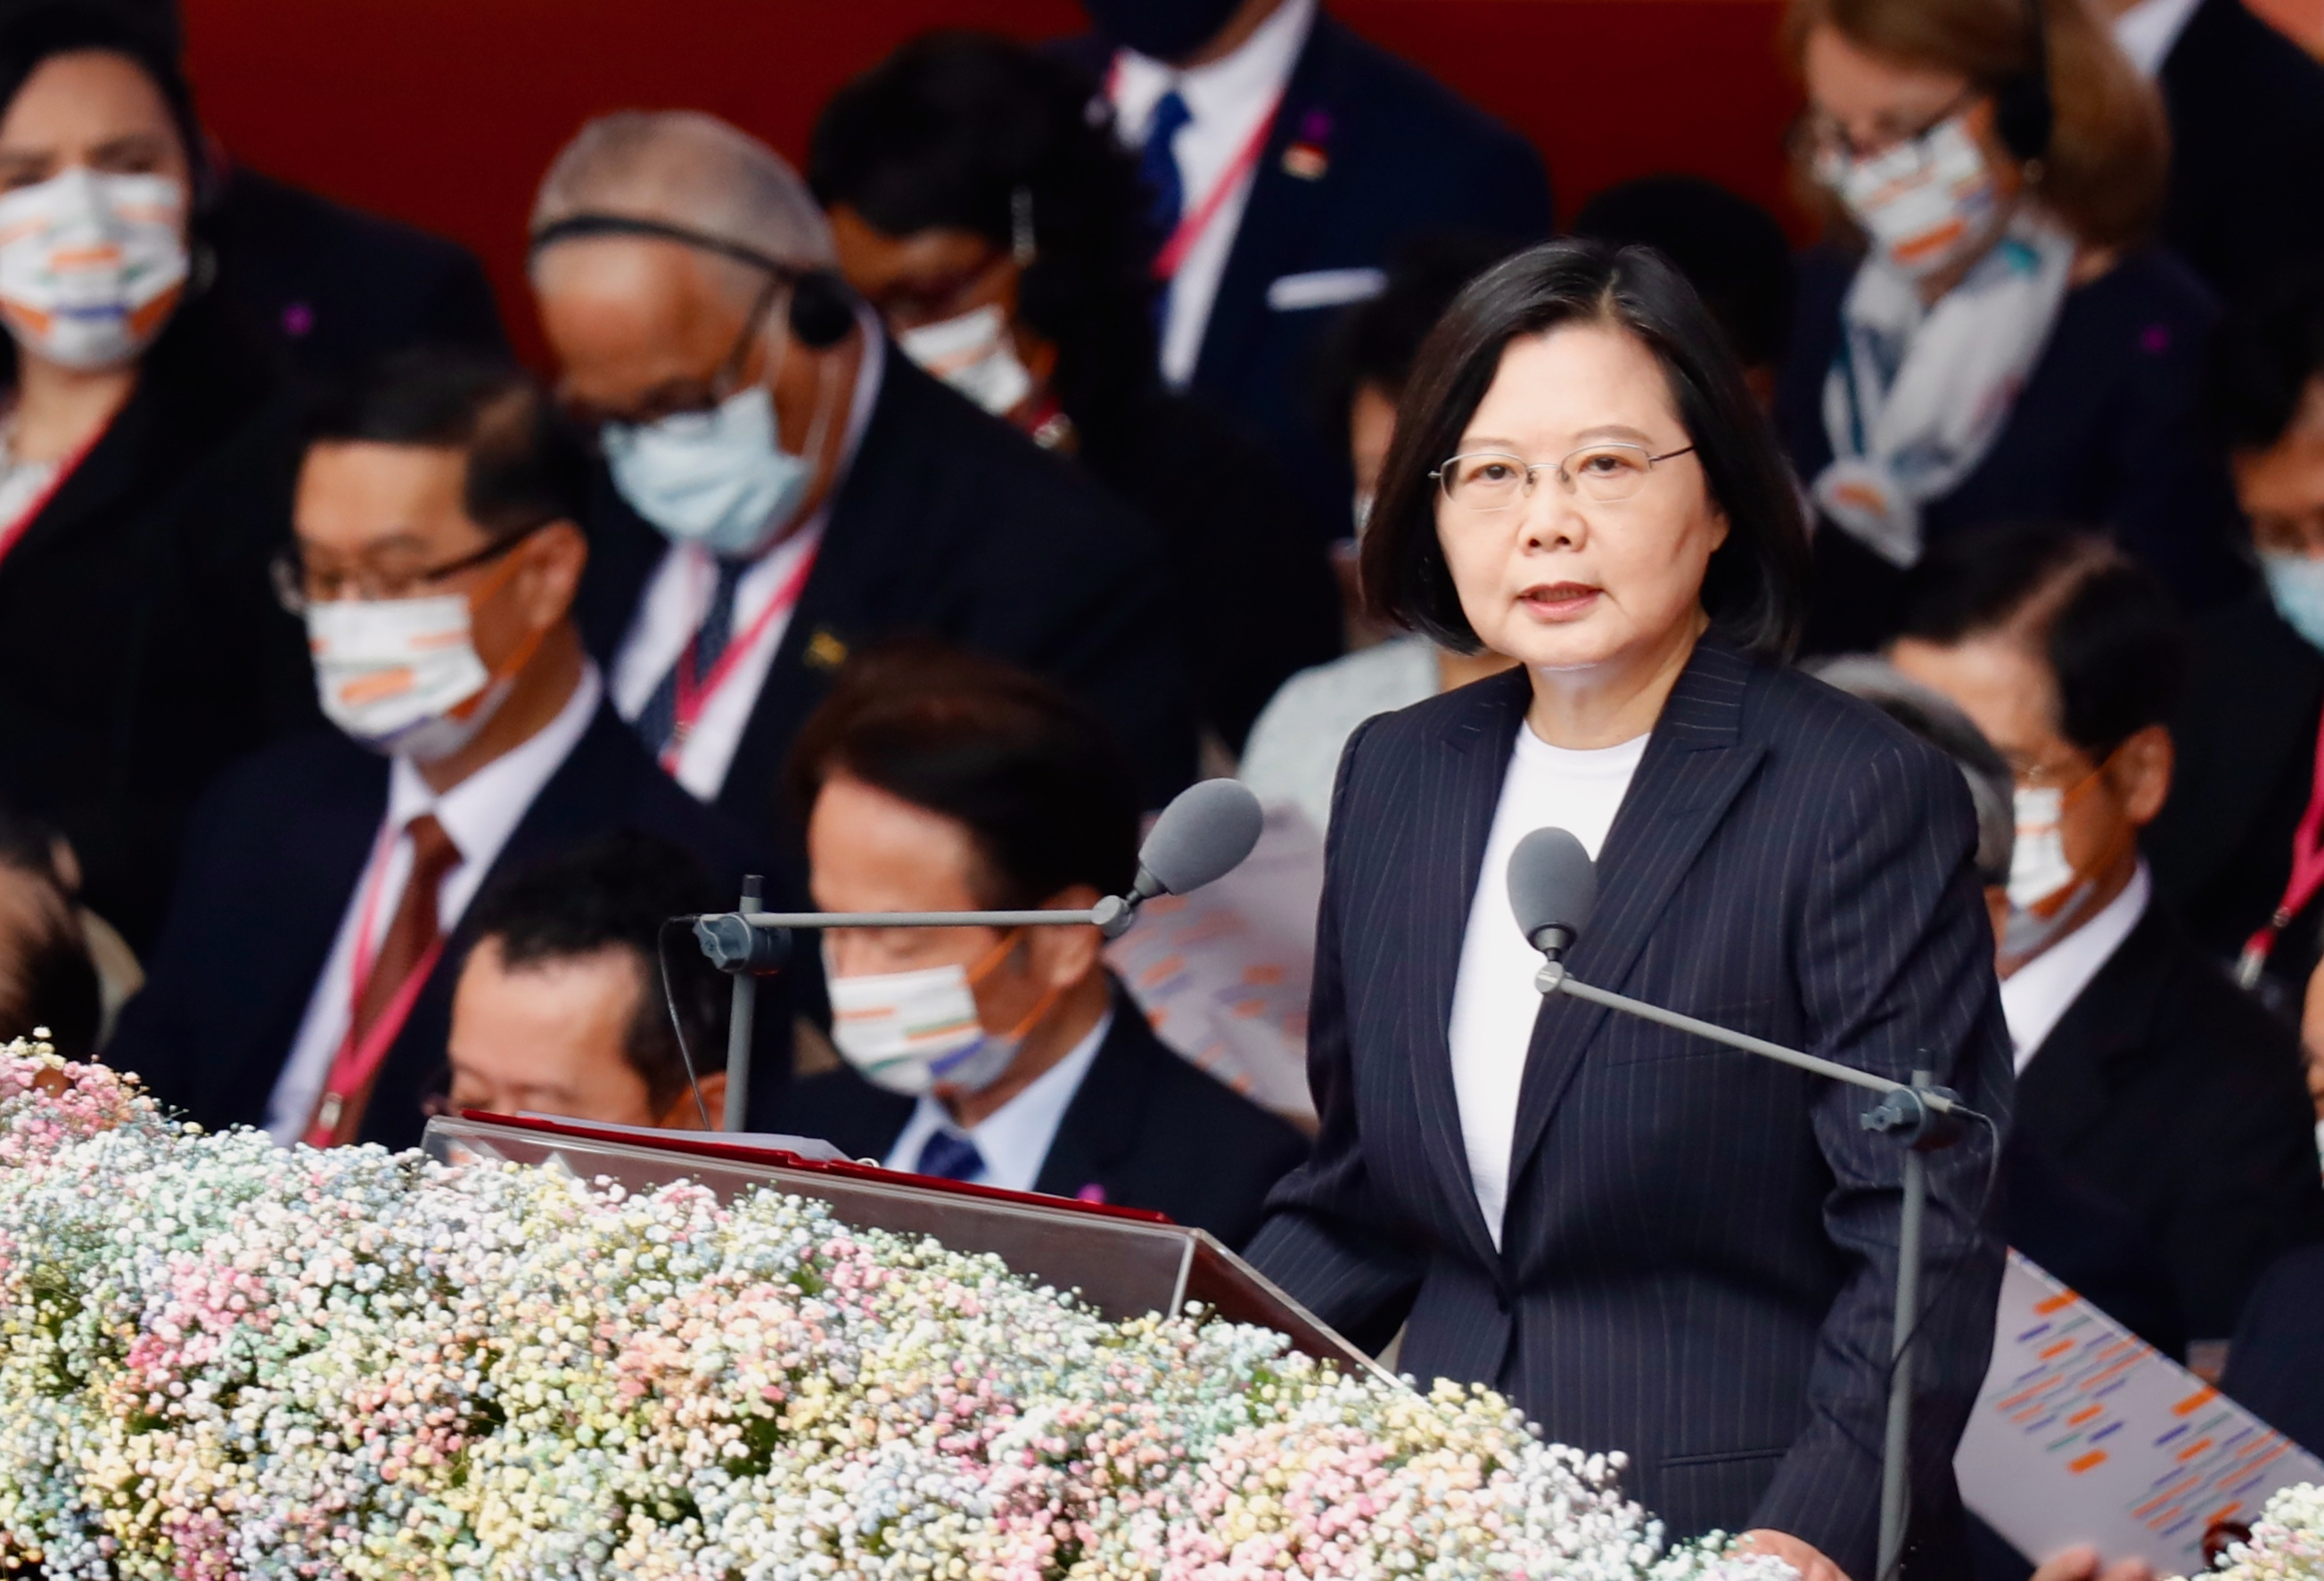 Understanding Beijing's motives regarding Taiwan, and America's role